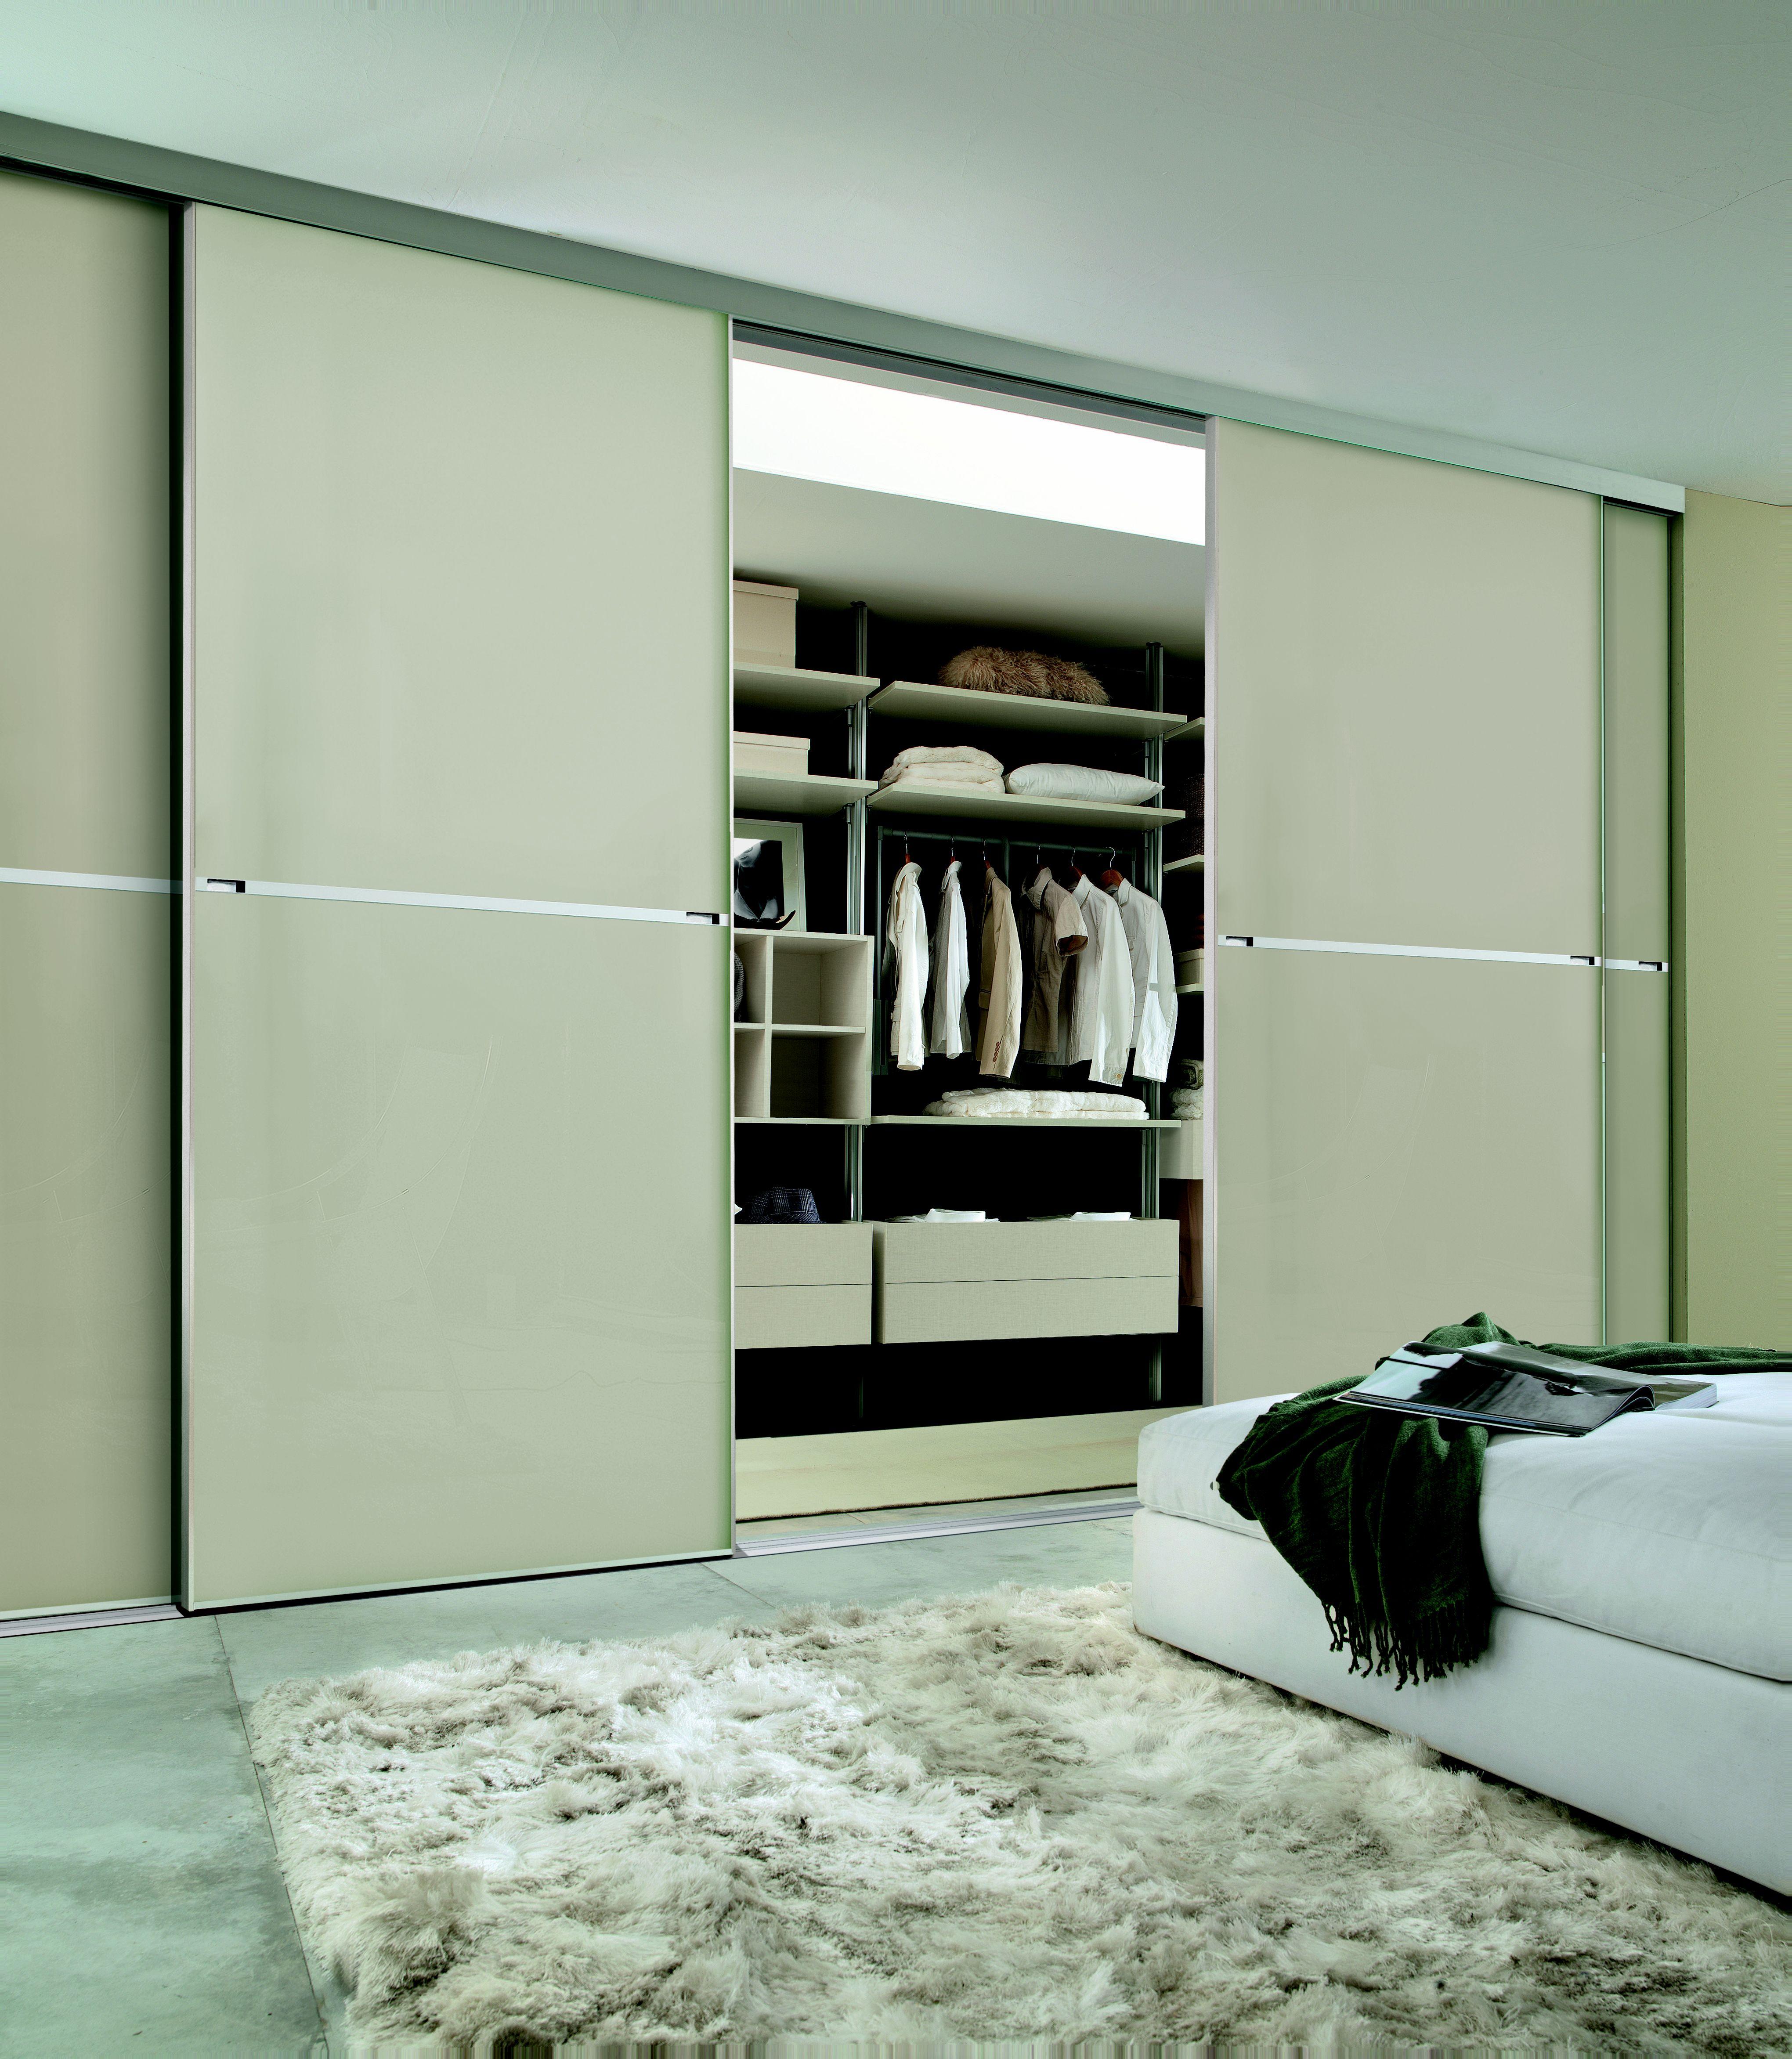 Minimalist made to measure sliding wardrobe doors in white & Sliding wardrobe doors buying guide | Ideas \u0026 Advice | DIY at B\u0026Q